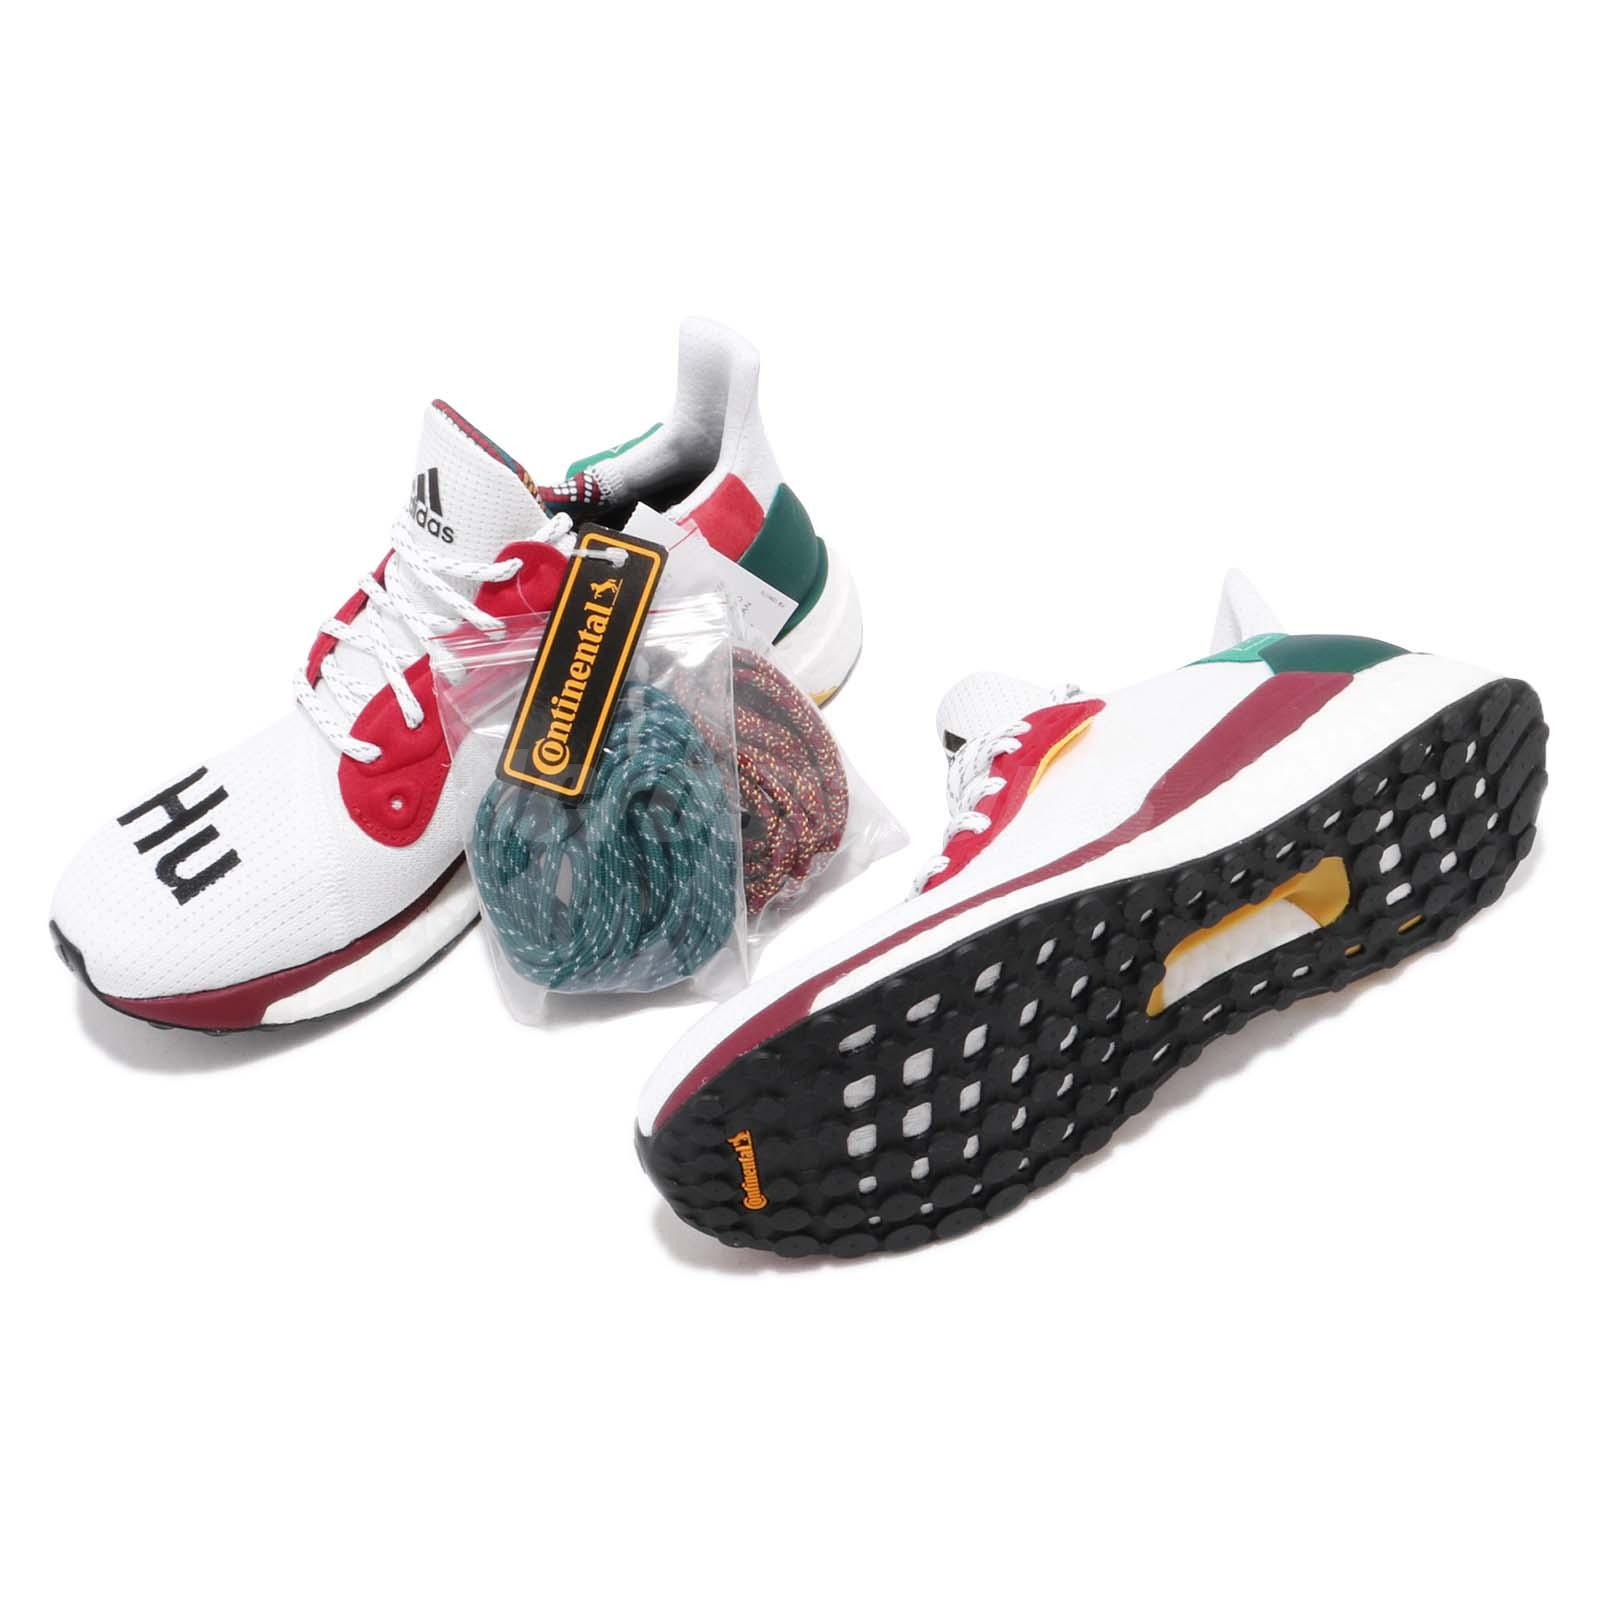 d4a3cad04 adidas Solar Hu Glide W Pharrell Williams White Black Red Green ...